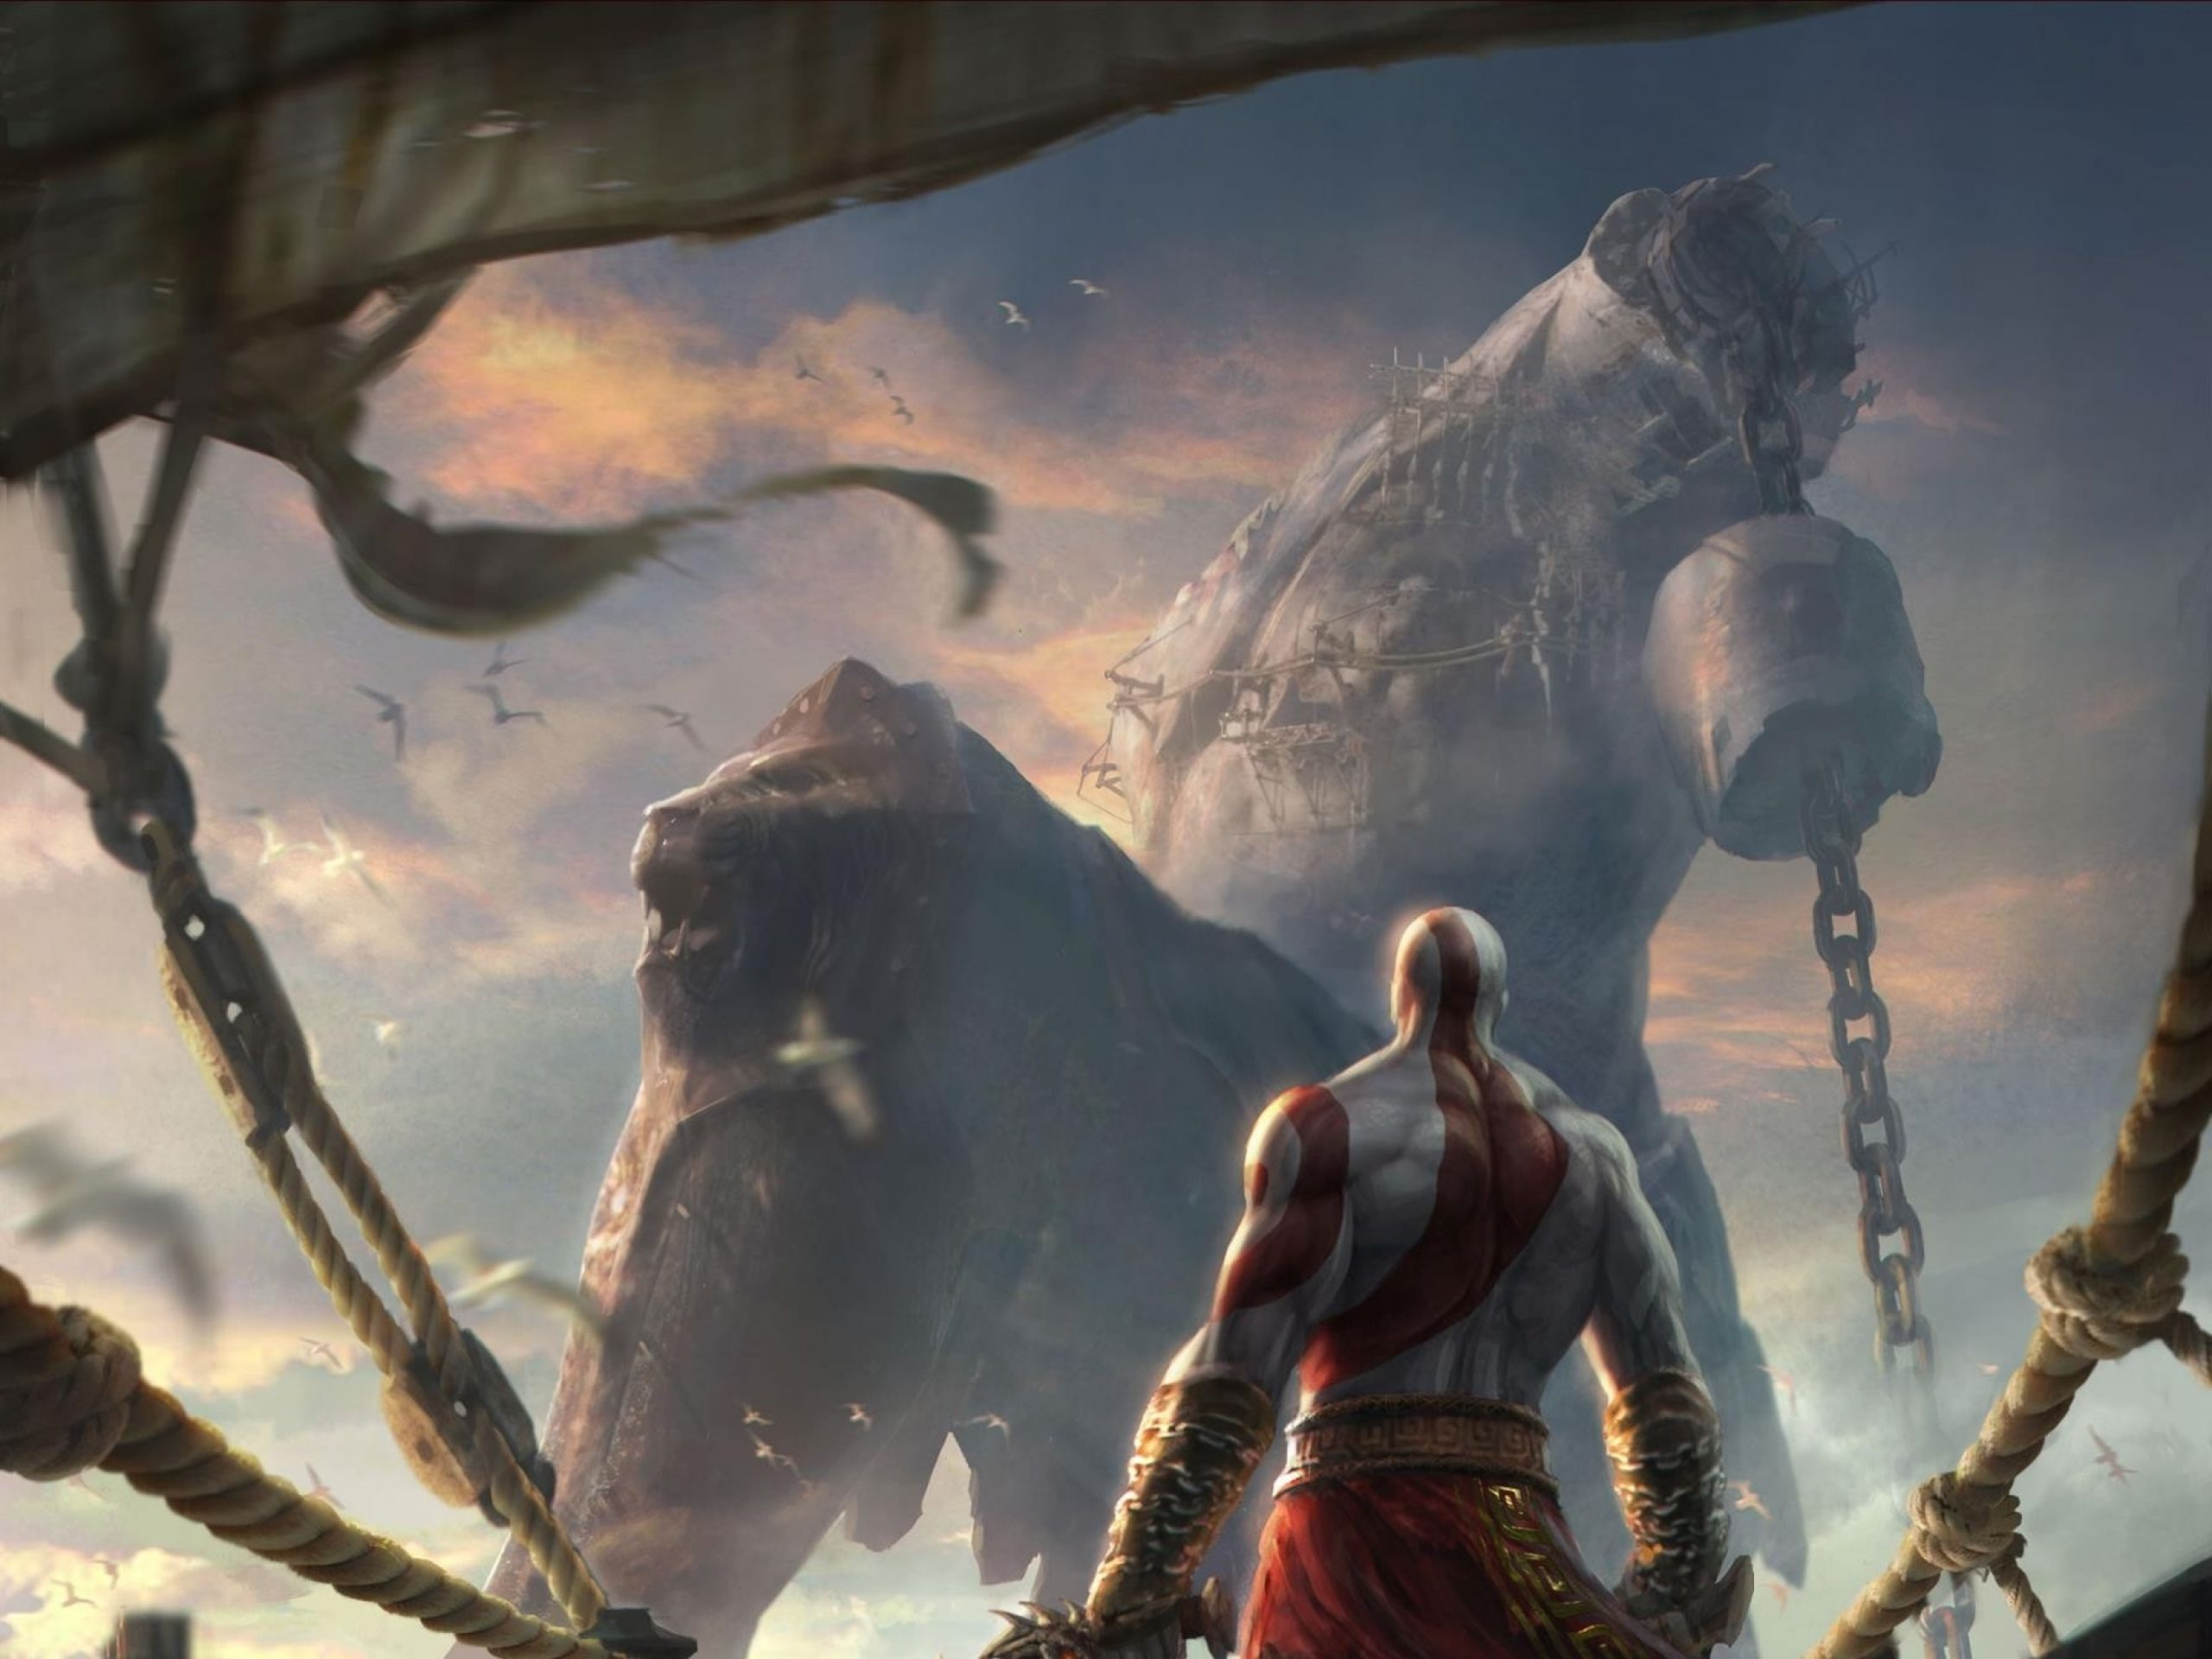 Download Wallpapers Download 2560x1920 God Of War Concept Art Artwork Chains Blades Kratos God Of Wa Kratos God Of War God Of War Kratos God Of War Wallpapers